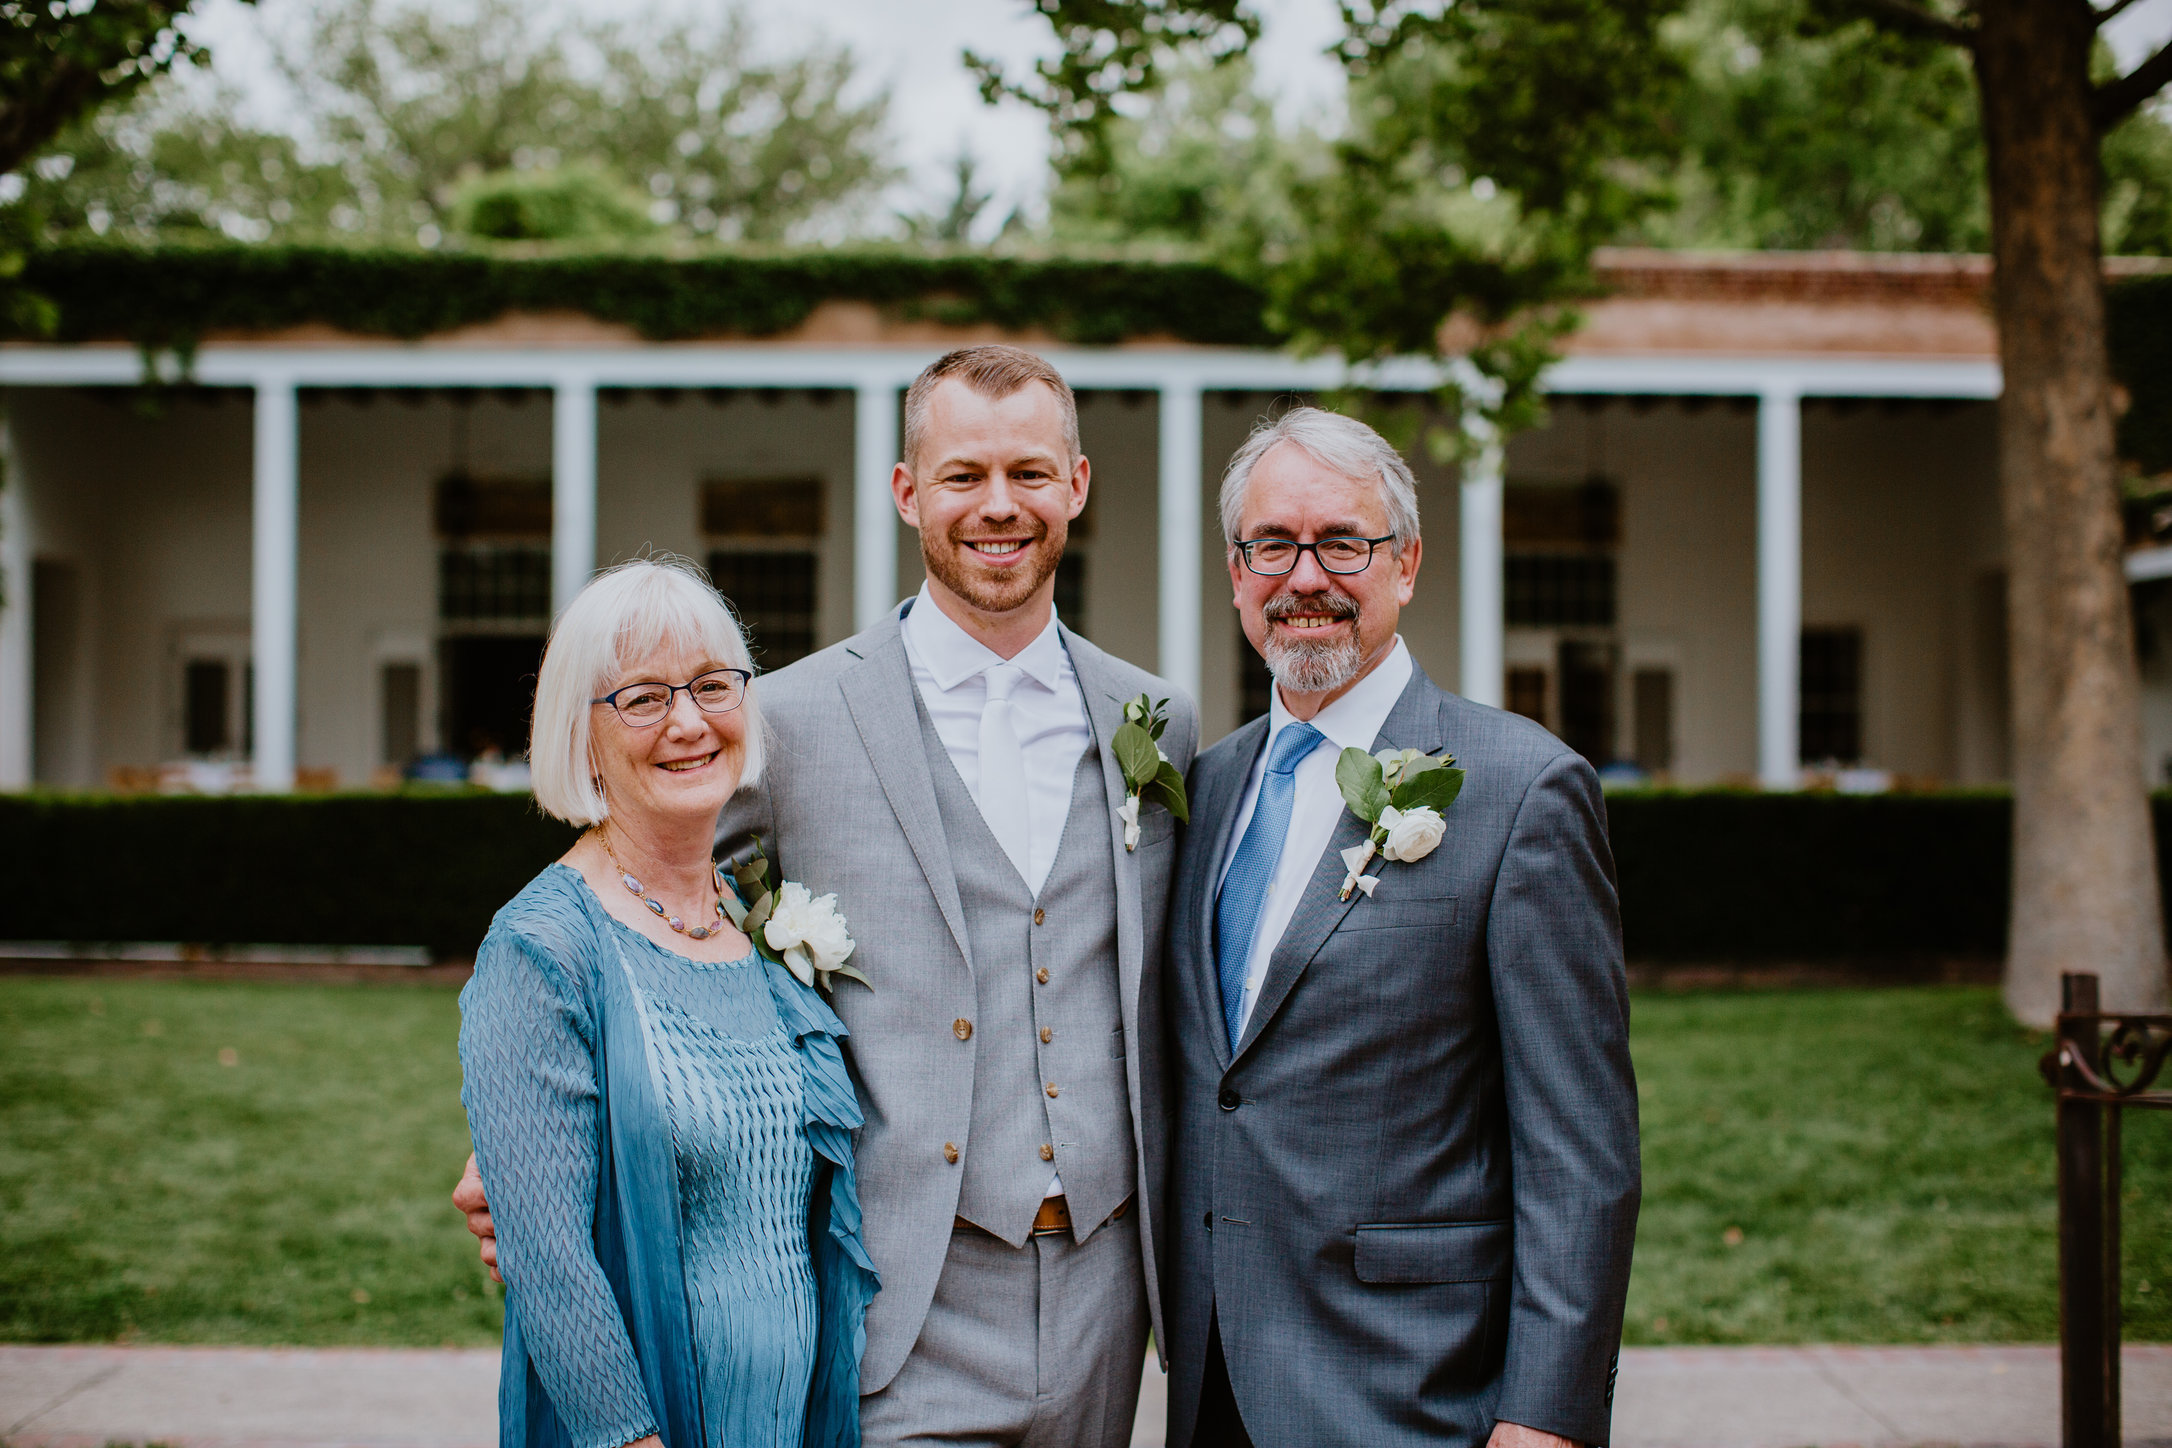 DandA-wedding-489.jpg